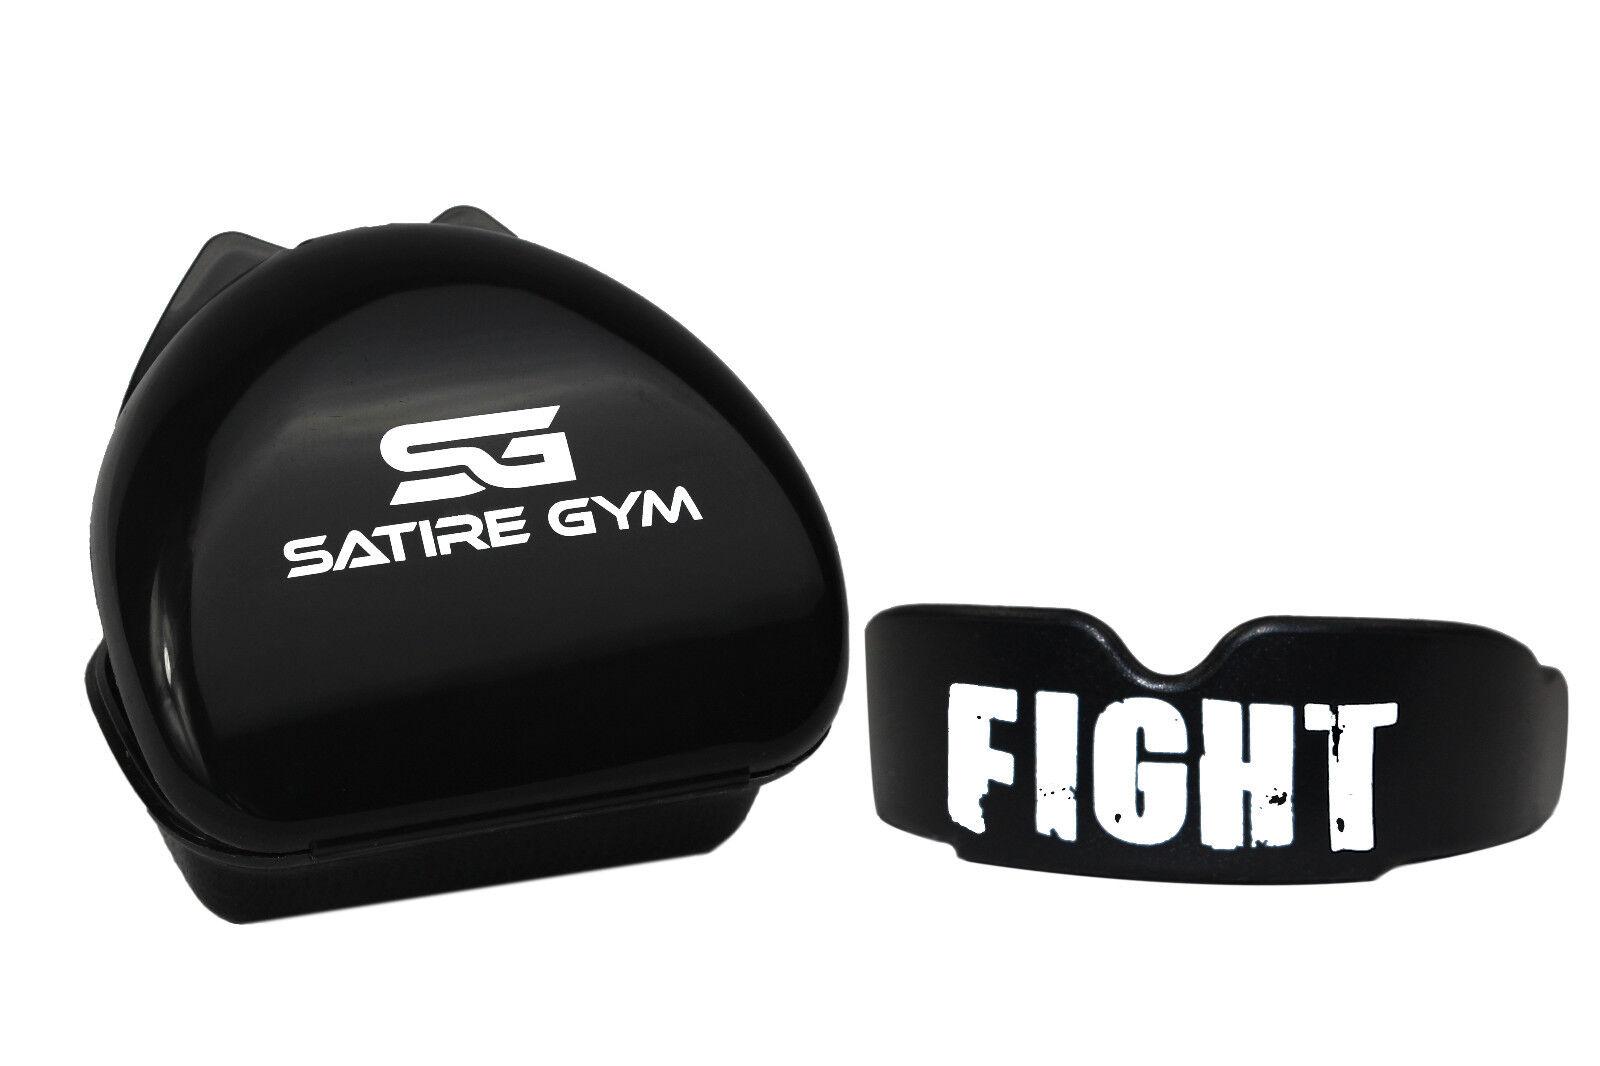 Mundschutz Kampfsport PREMIUM Mouthguard Boxen MMA Zahnschutz Kickboxen Boxen